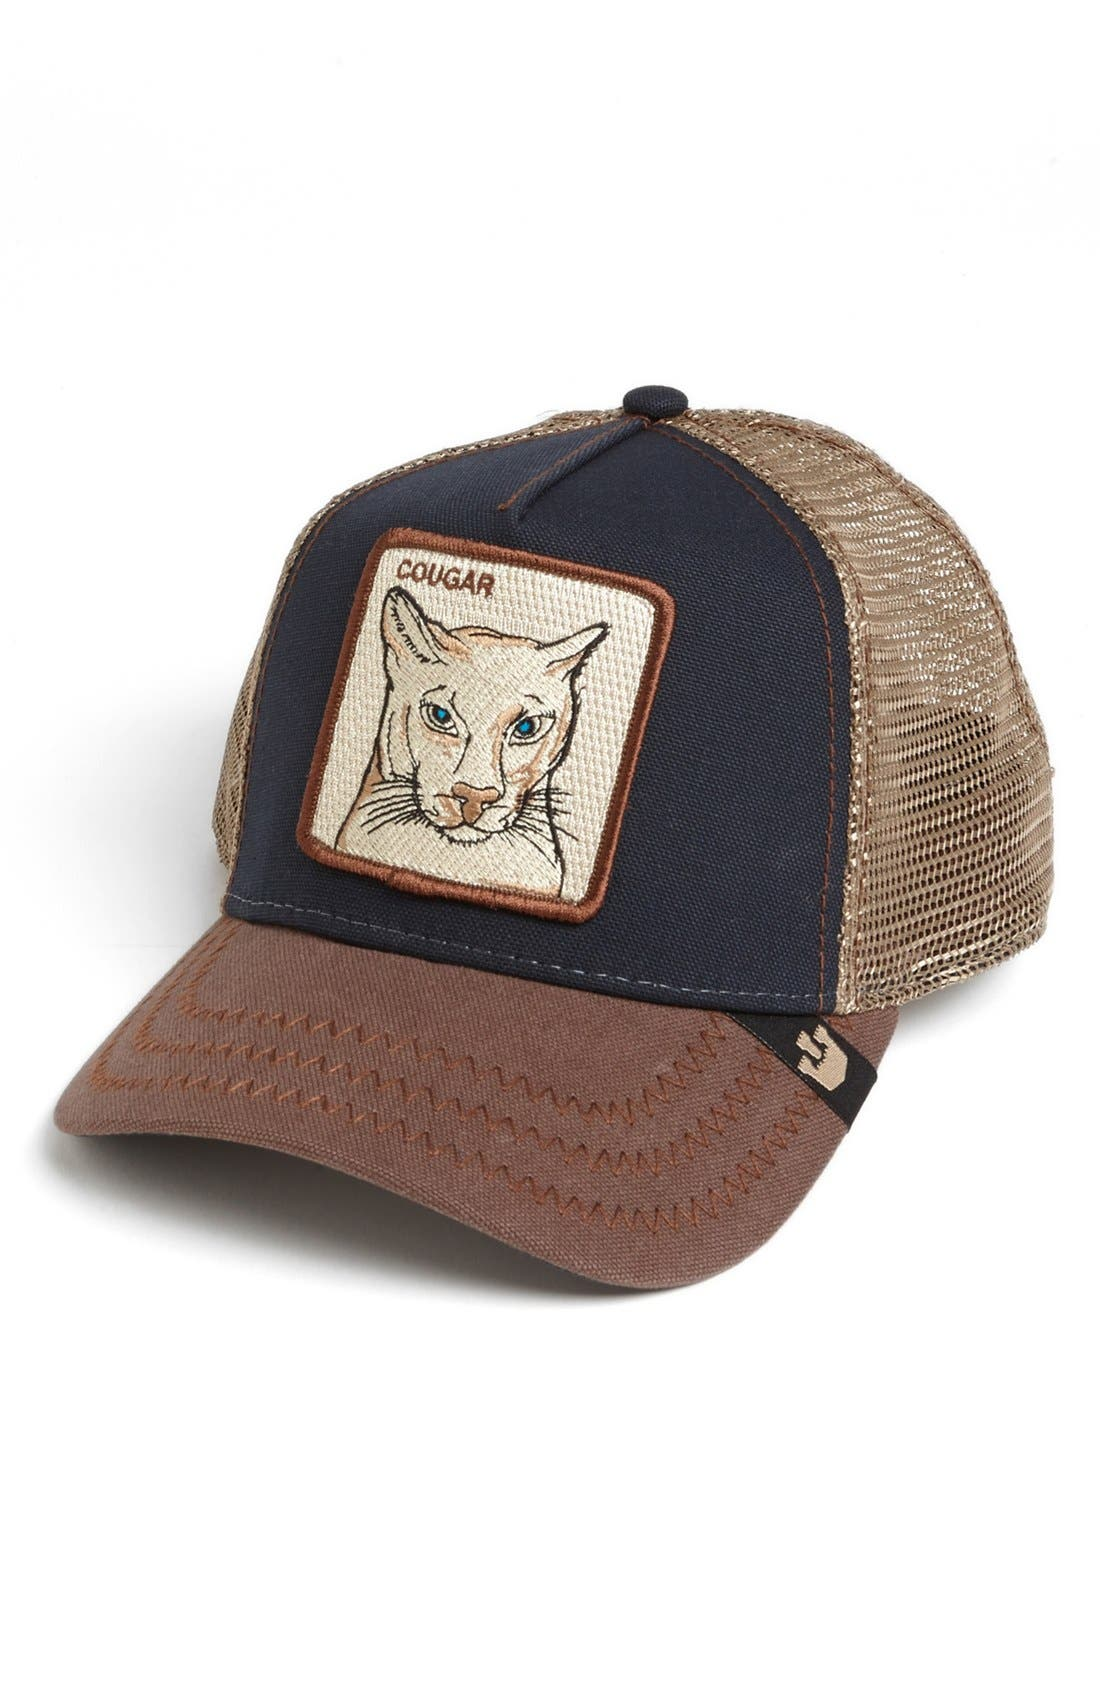 'Animal Farm - Cougar' Trucker Hat,                             Main thumbnail 1, color,                             415